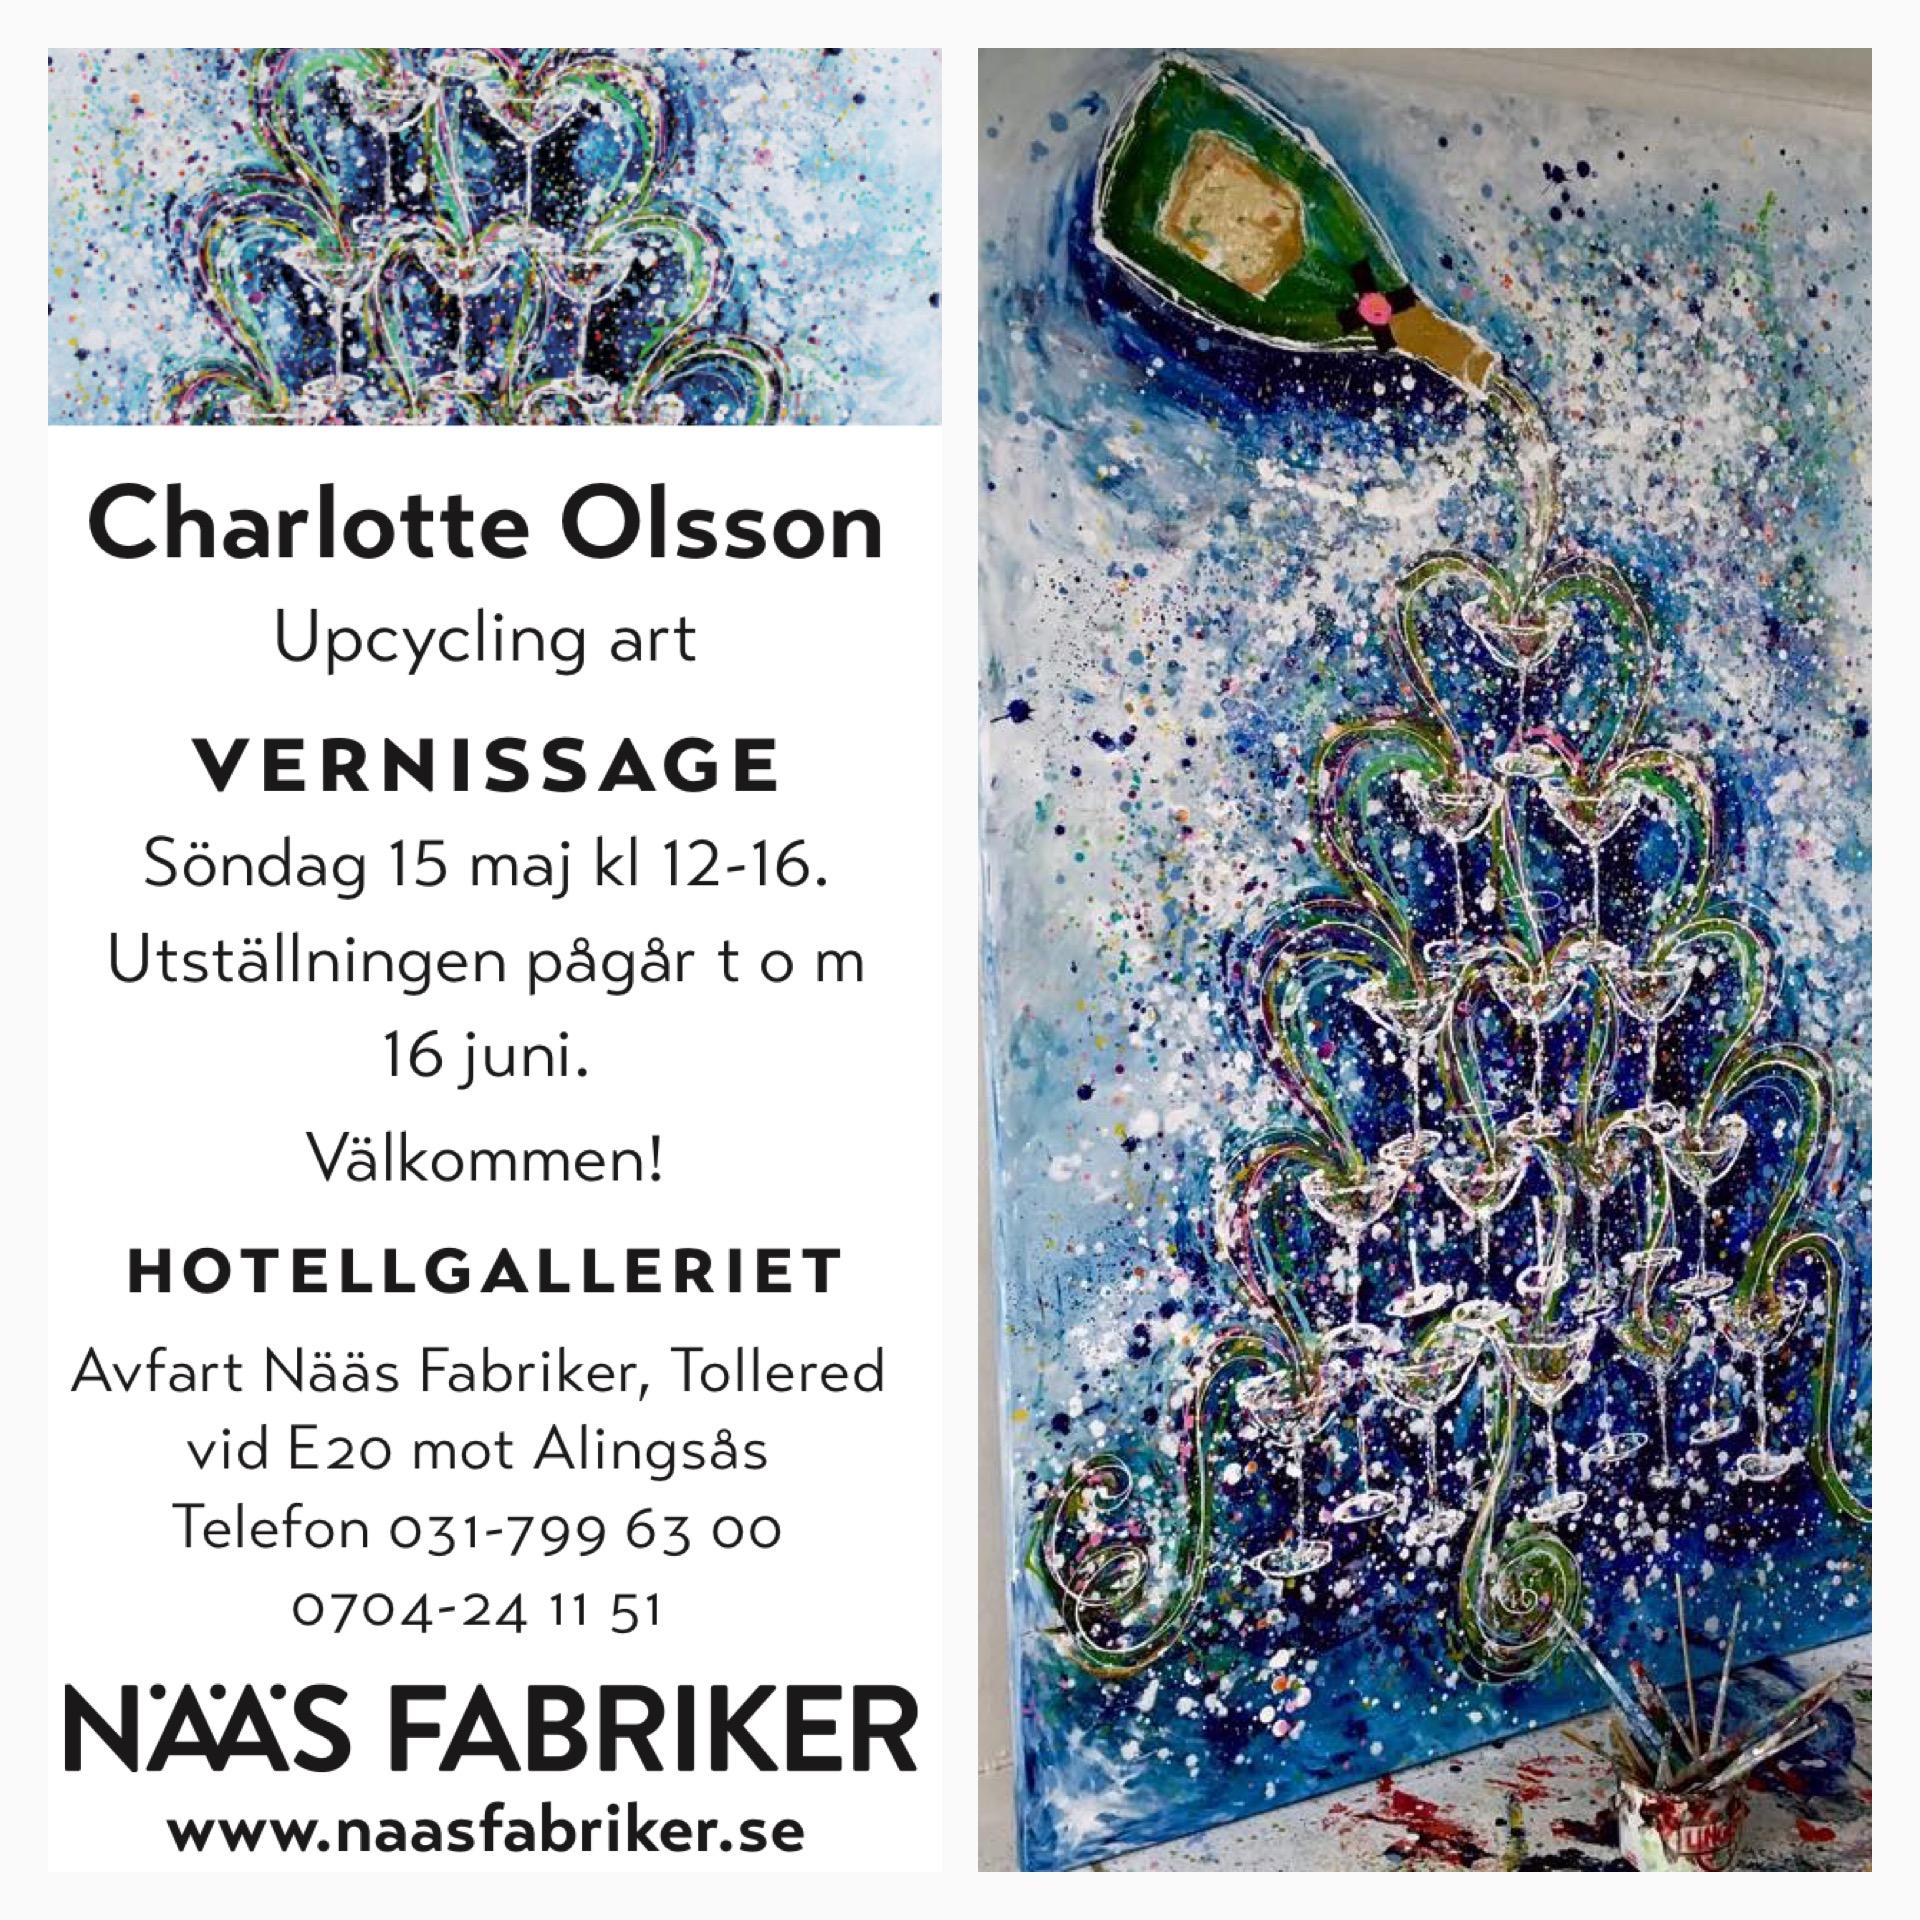 Charlotte olsson Art Konst Artist Konstnär Upcyclingart colorful swedishart original